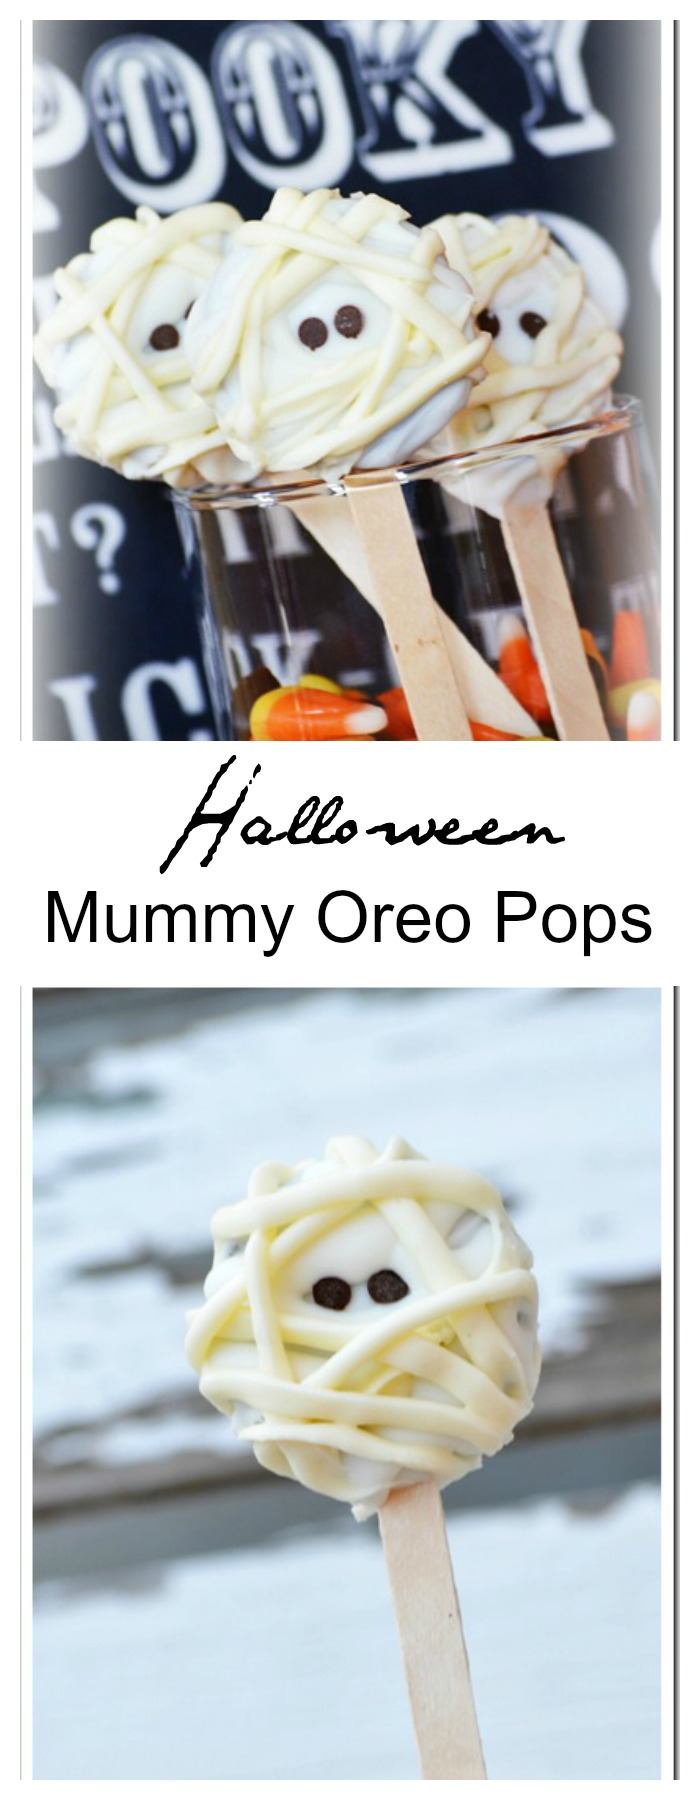 Halloween-Mummy-Oreo-Pops